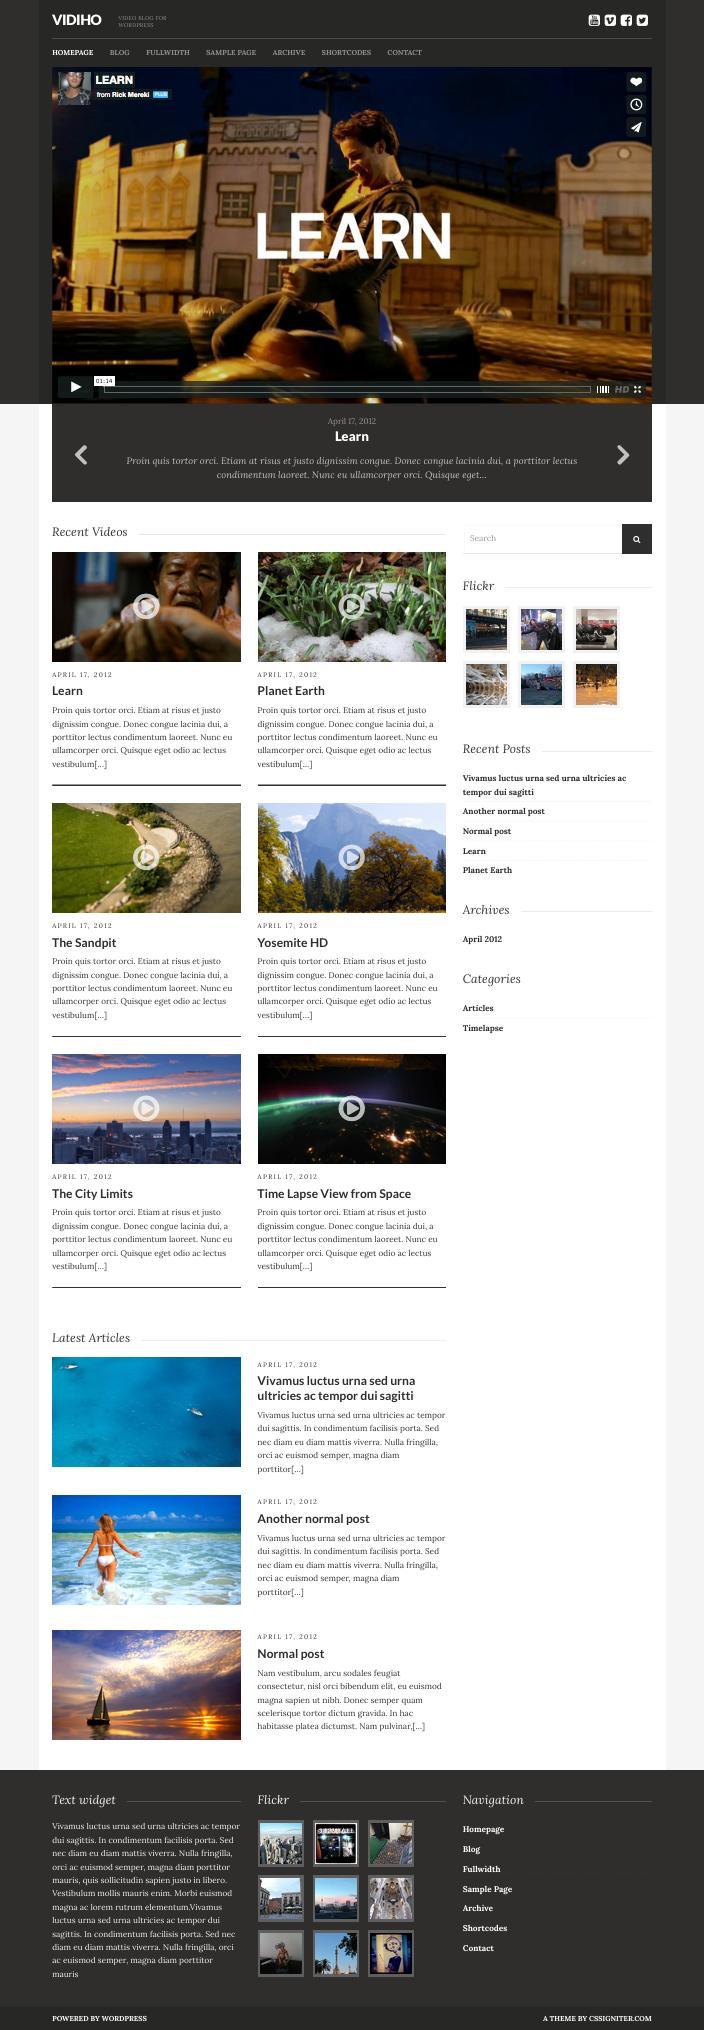 Vidiho WordPress Video Blogging Theme